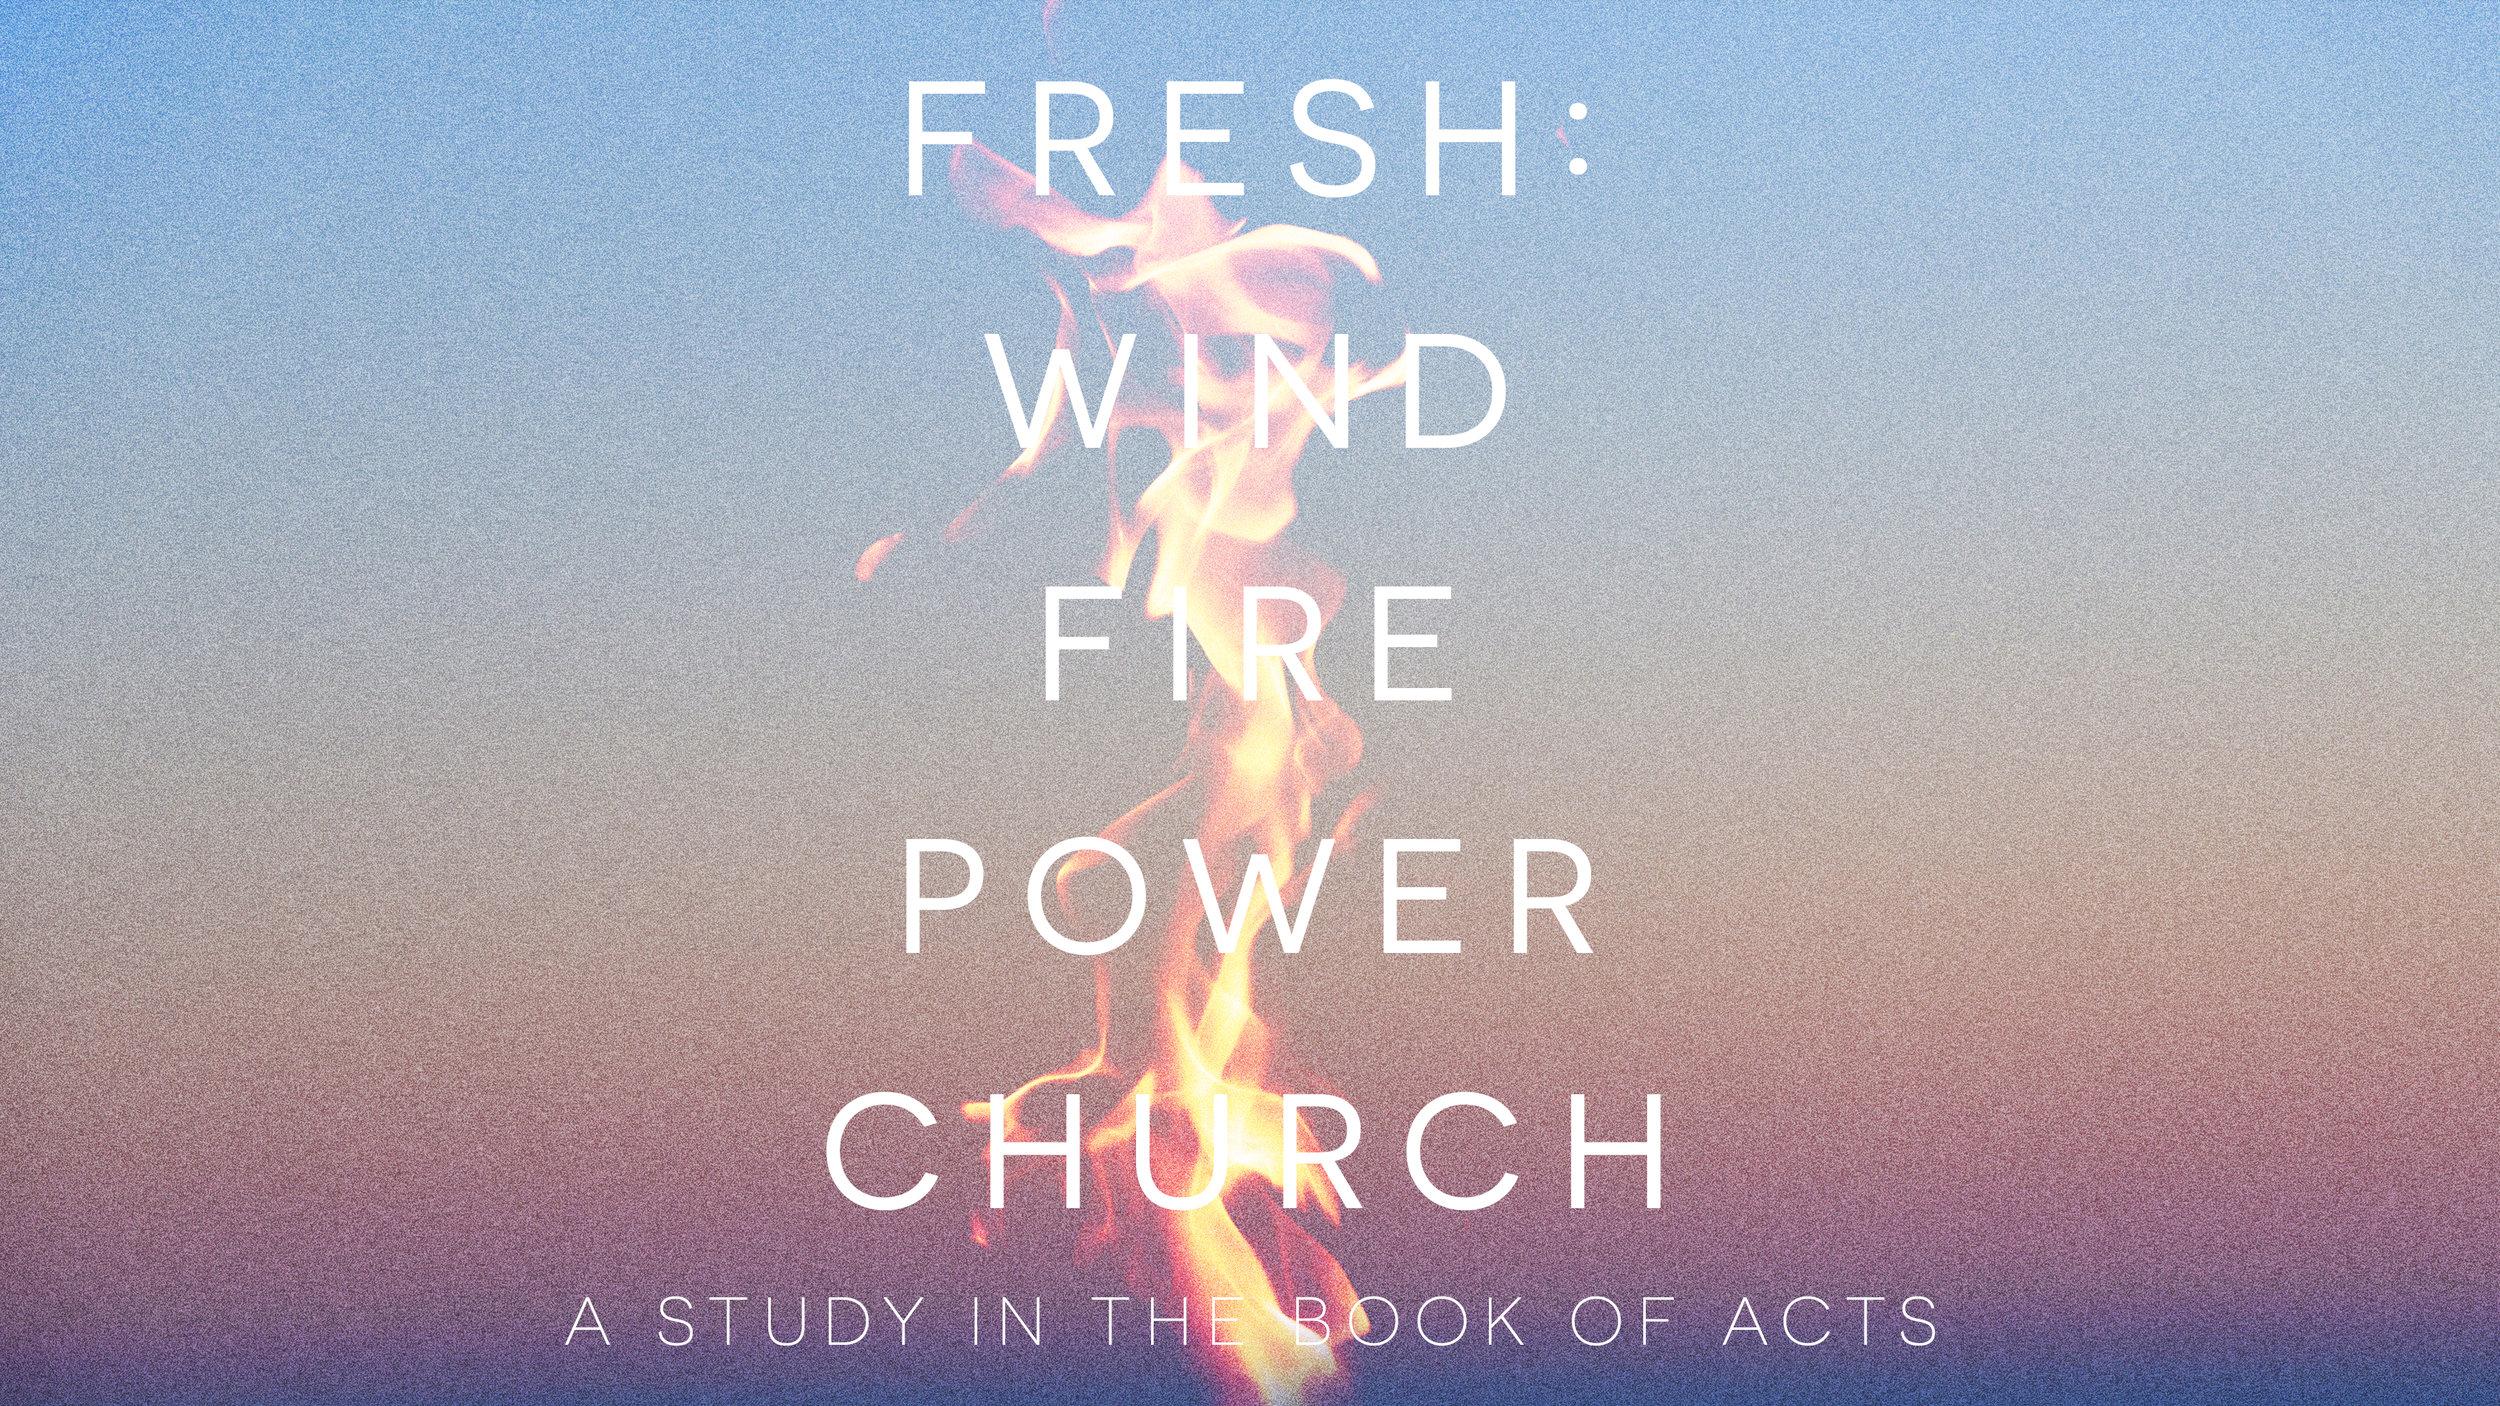 Fresh_Wind_Fire_Power_Church.jpg